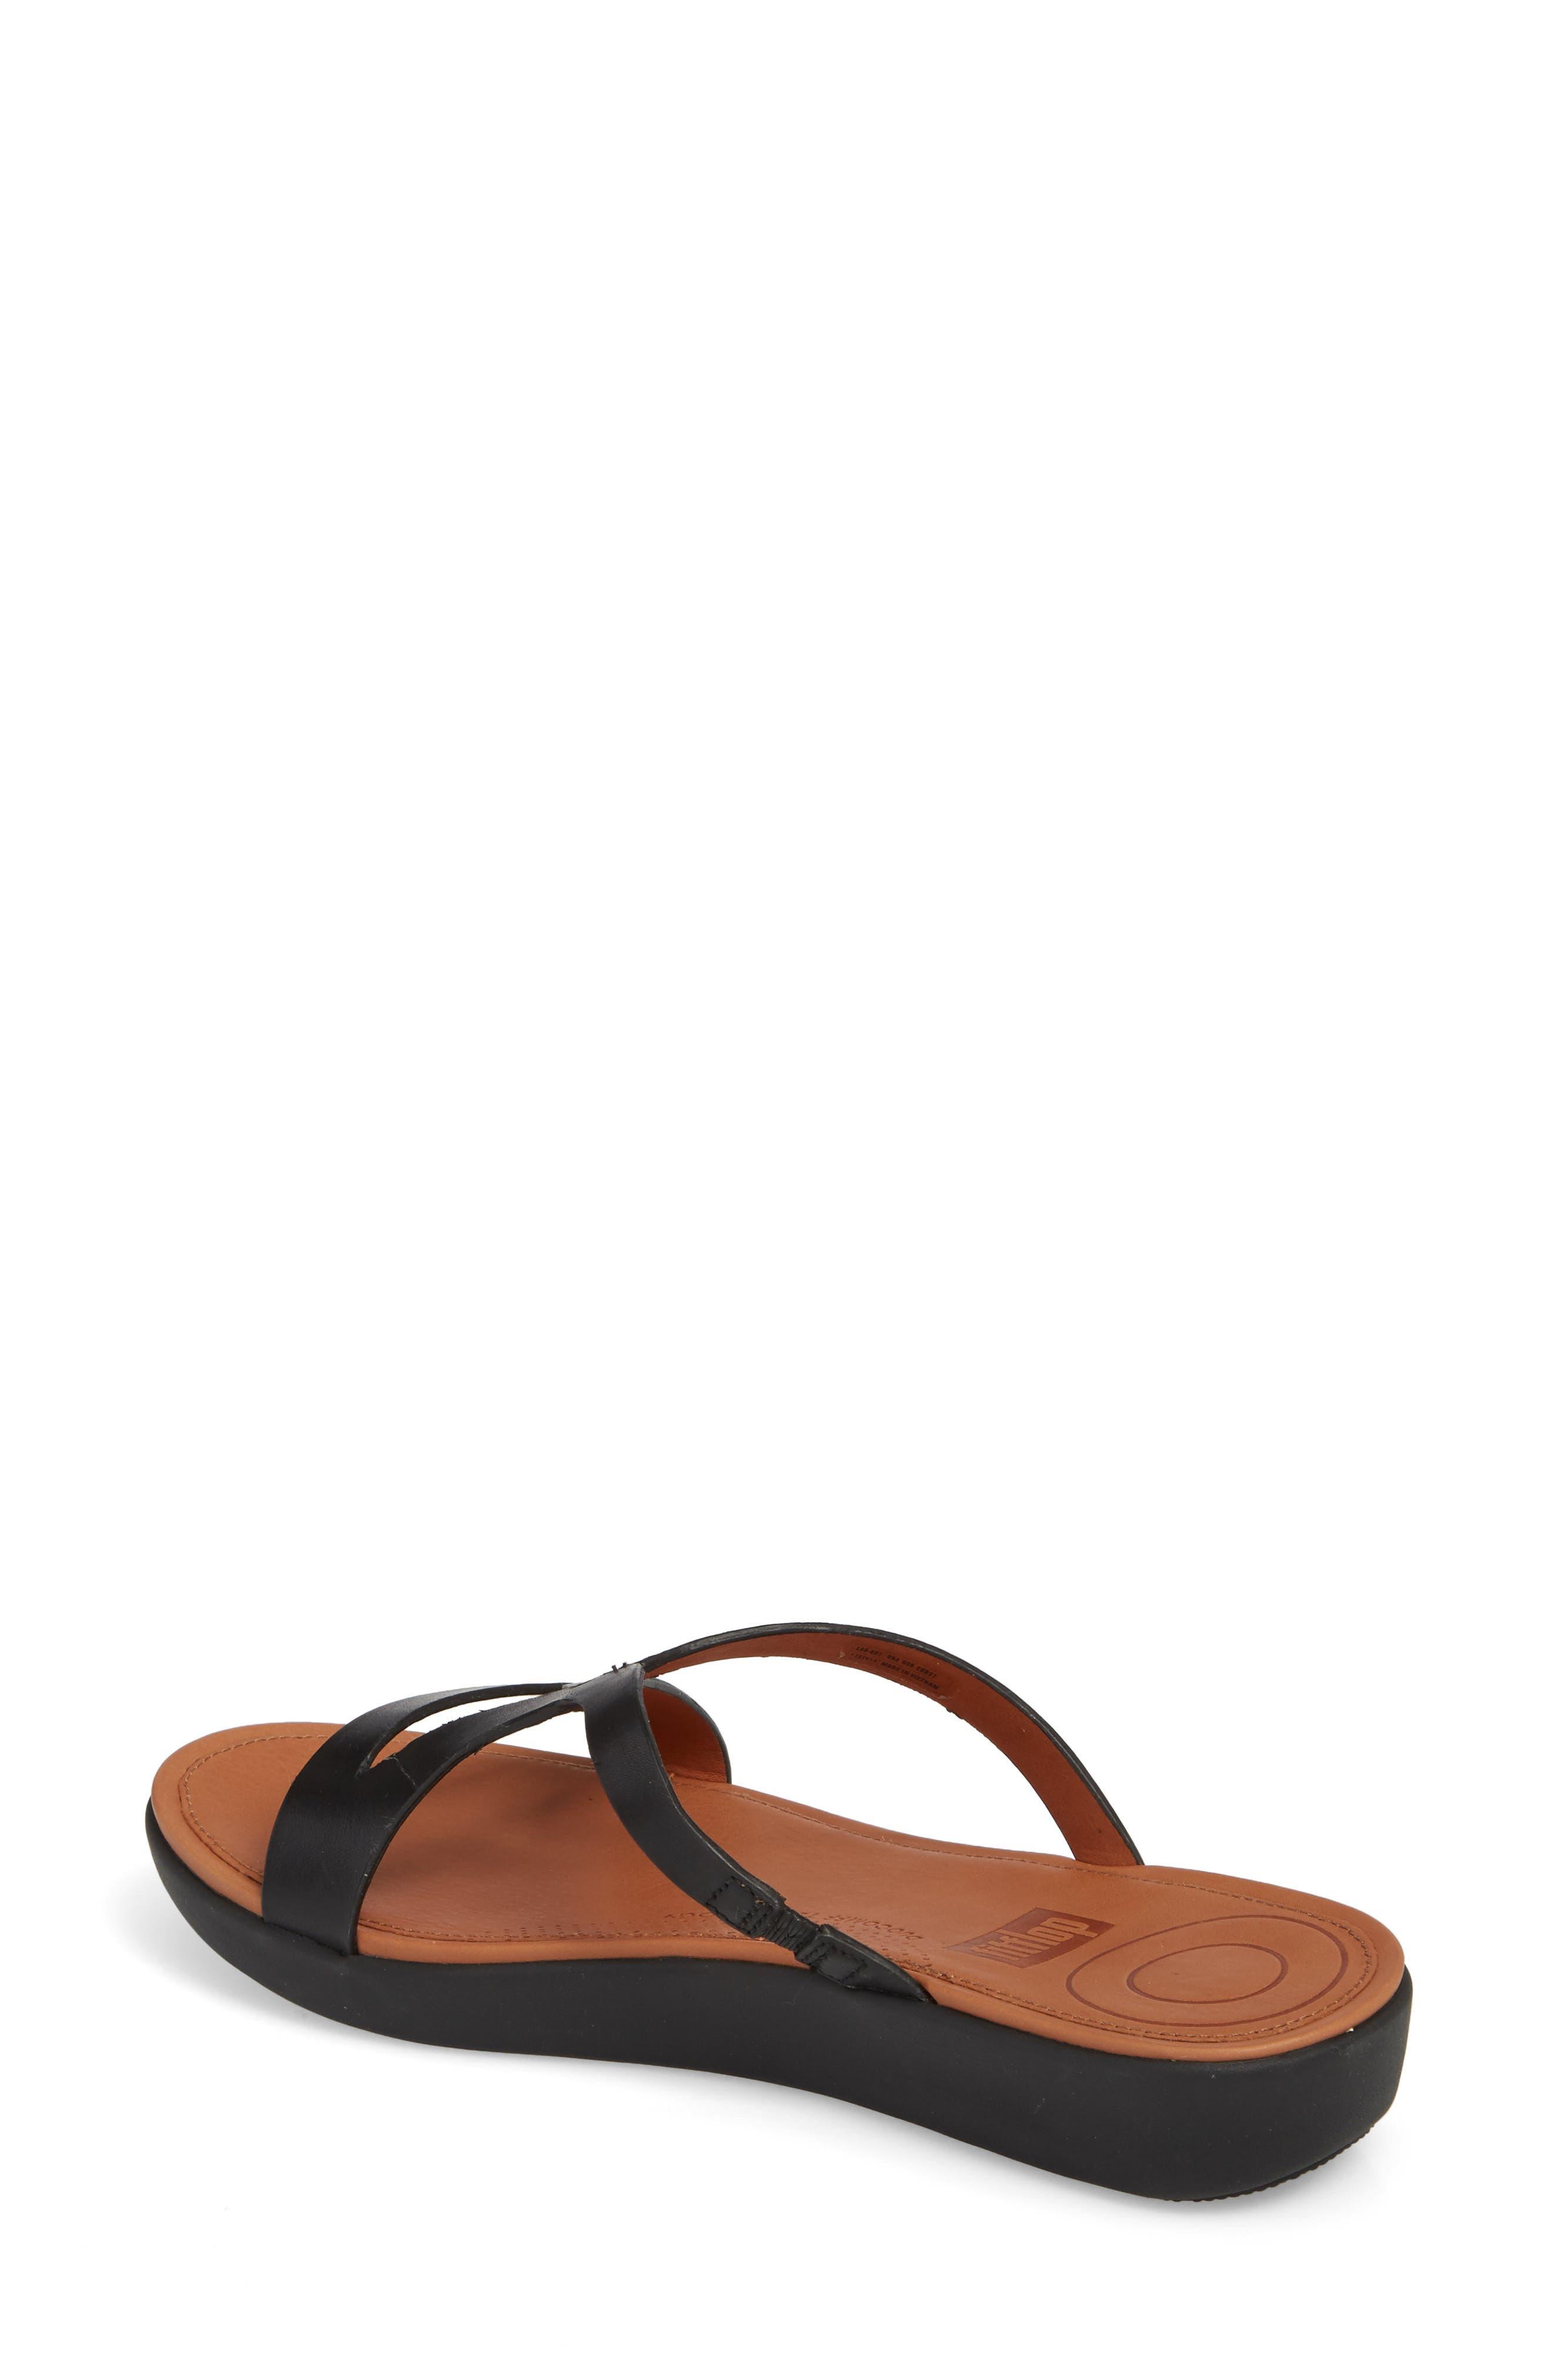 FITFLOP,                             Strata Slide Sandals,                             Alternate thumbnail 2, color,                             001